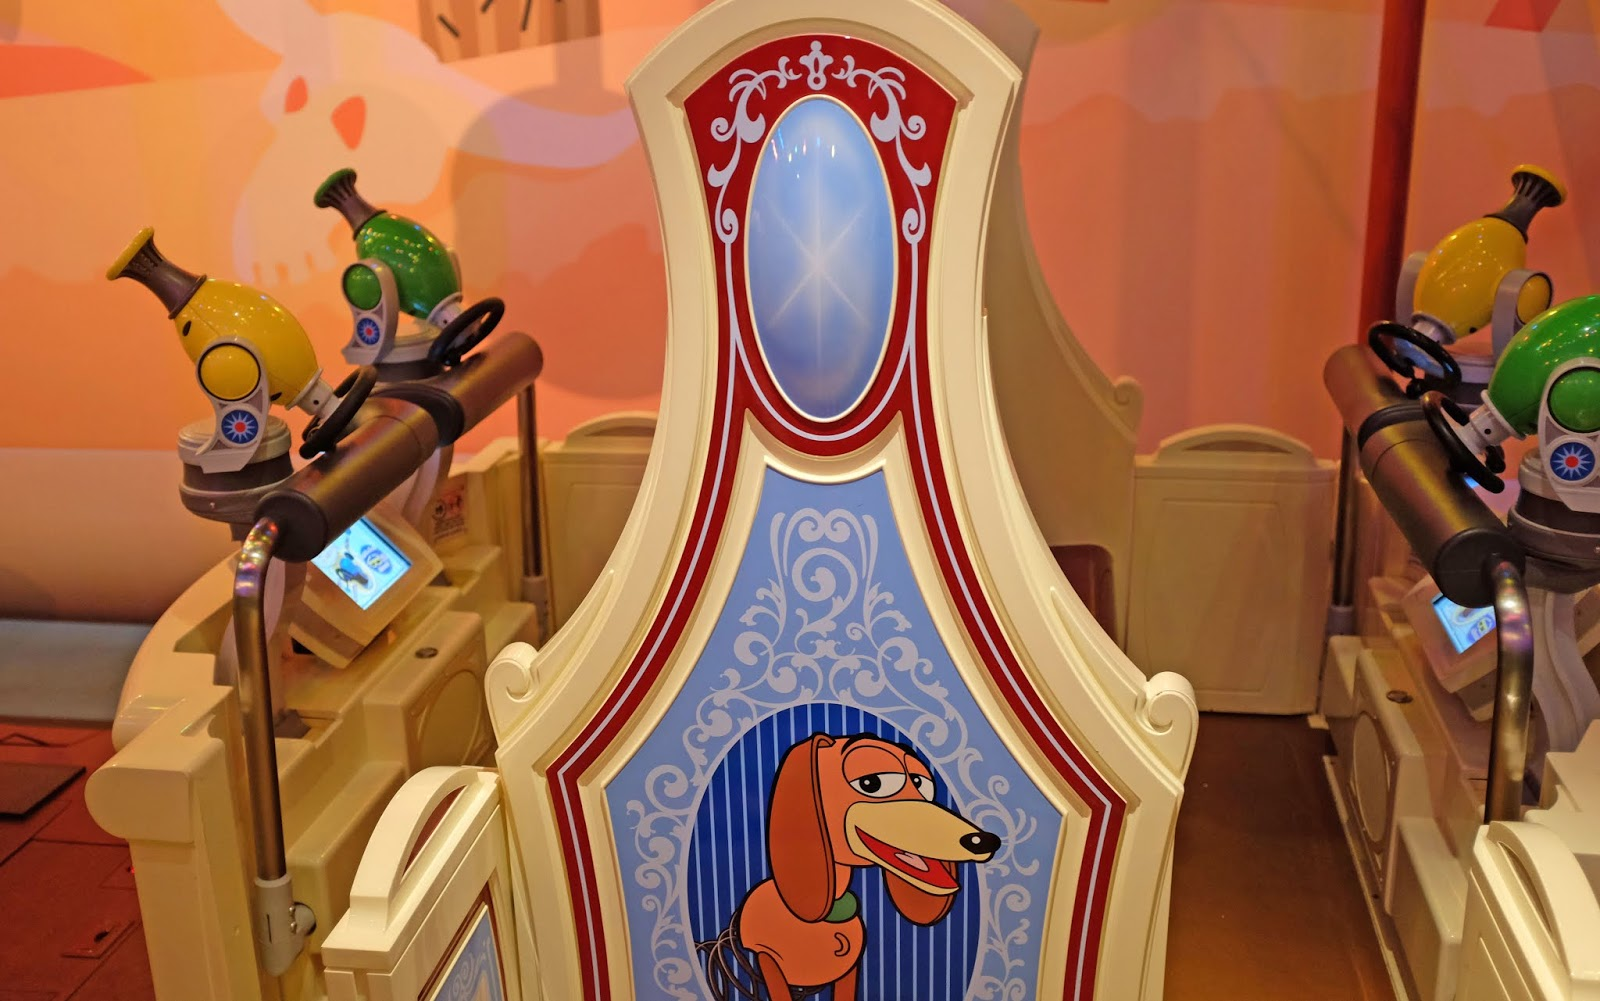 Toy Story Midway Mania ride at Hollywood Studios, Walt Disney World